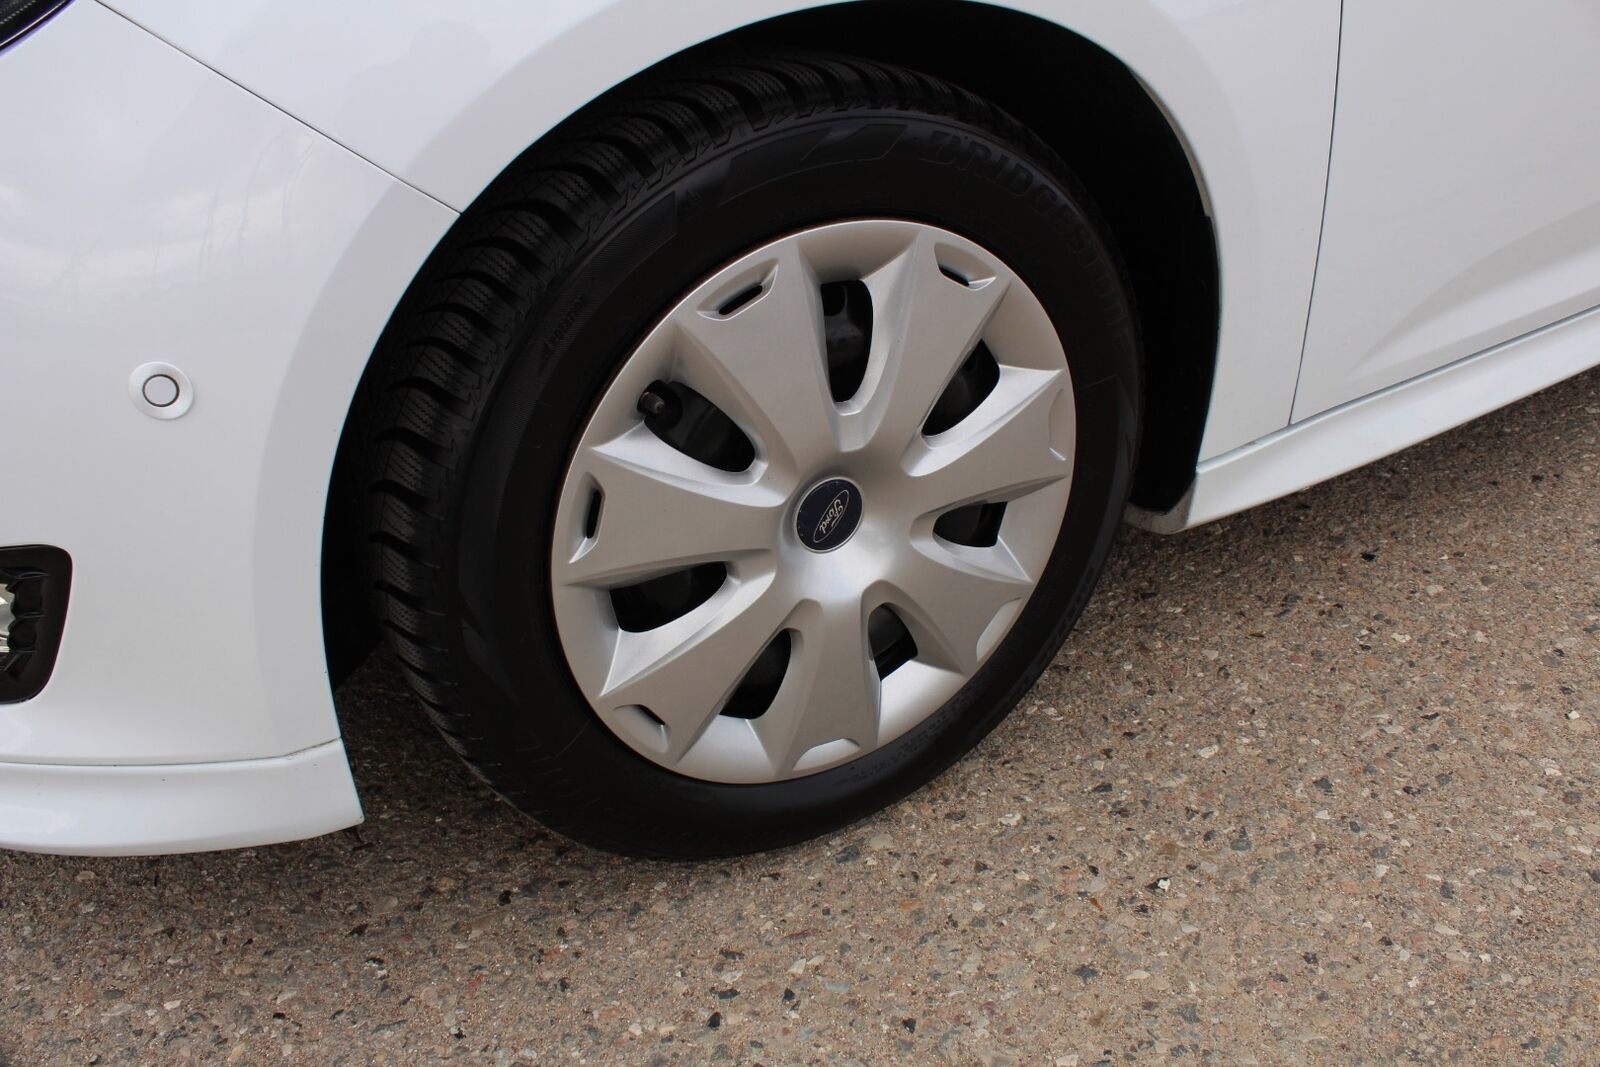 Ford Focus 1,5 TDCi 120 ST-Line stc. aut. - billede 6